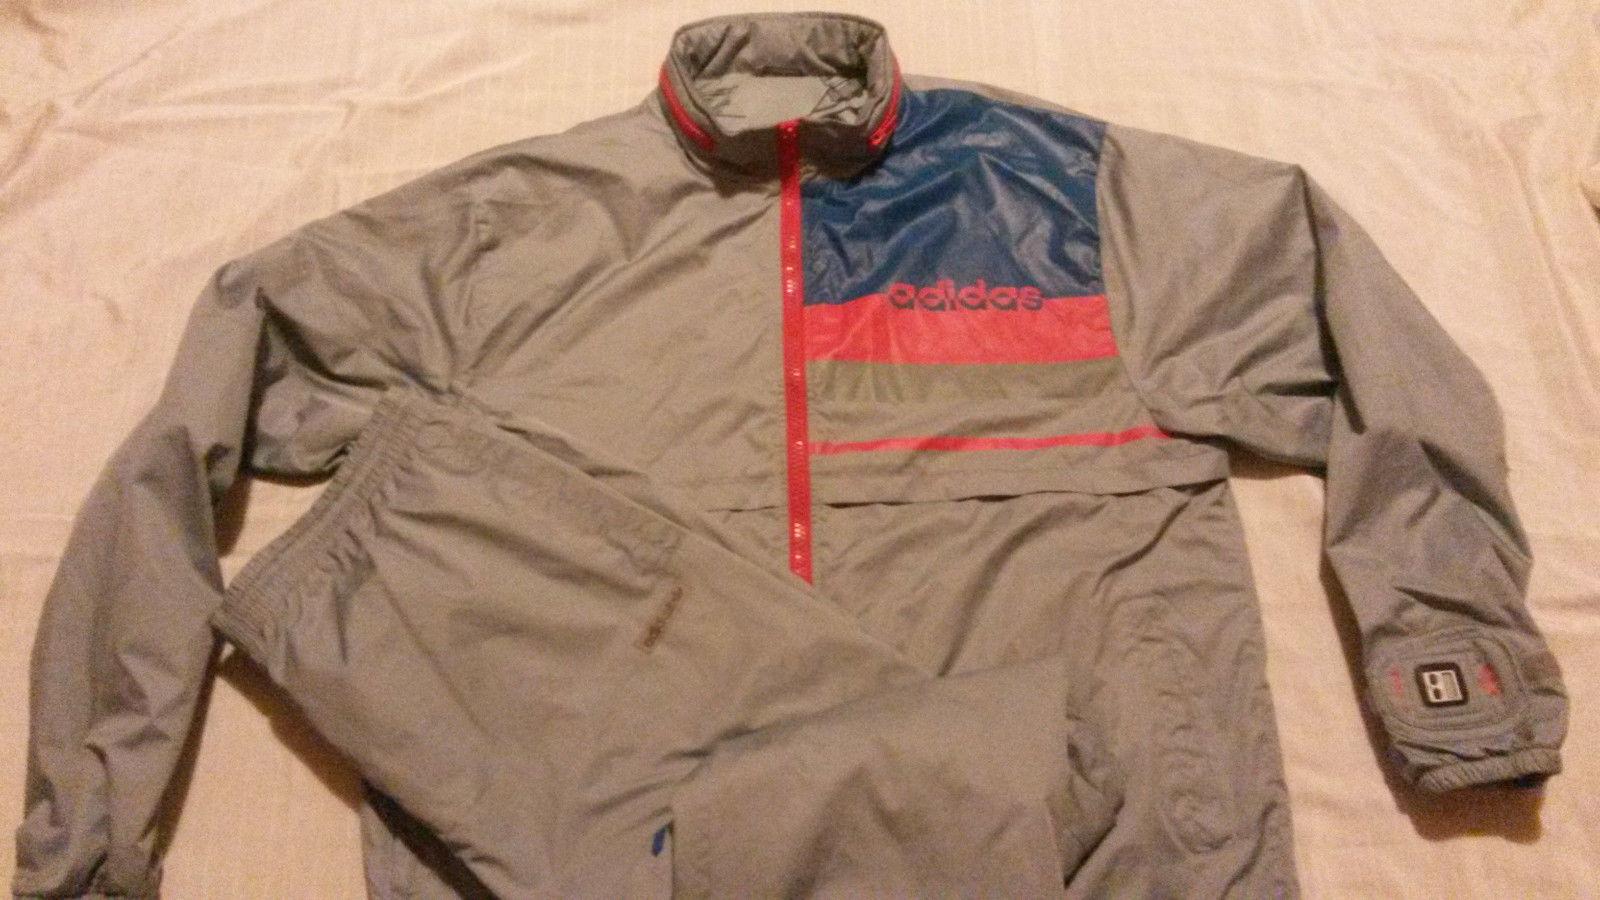 Original adidas entrenamiento Traje XL micropacer plata extremamujerte Jacket trousers